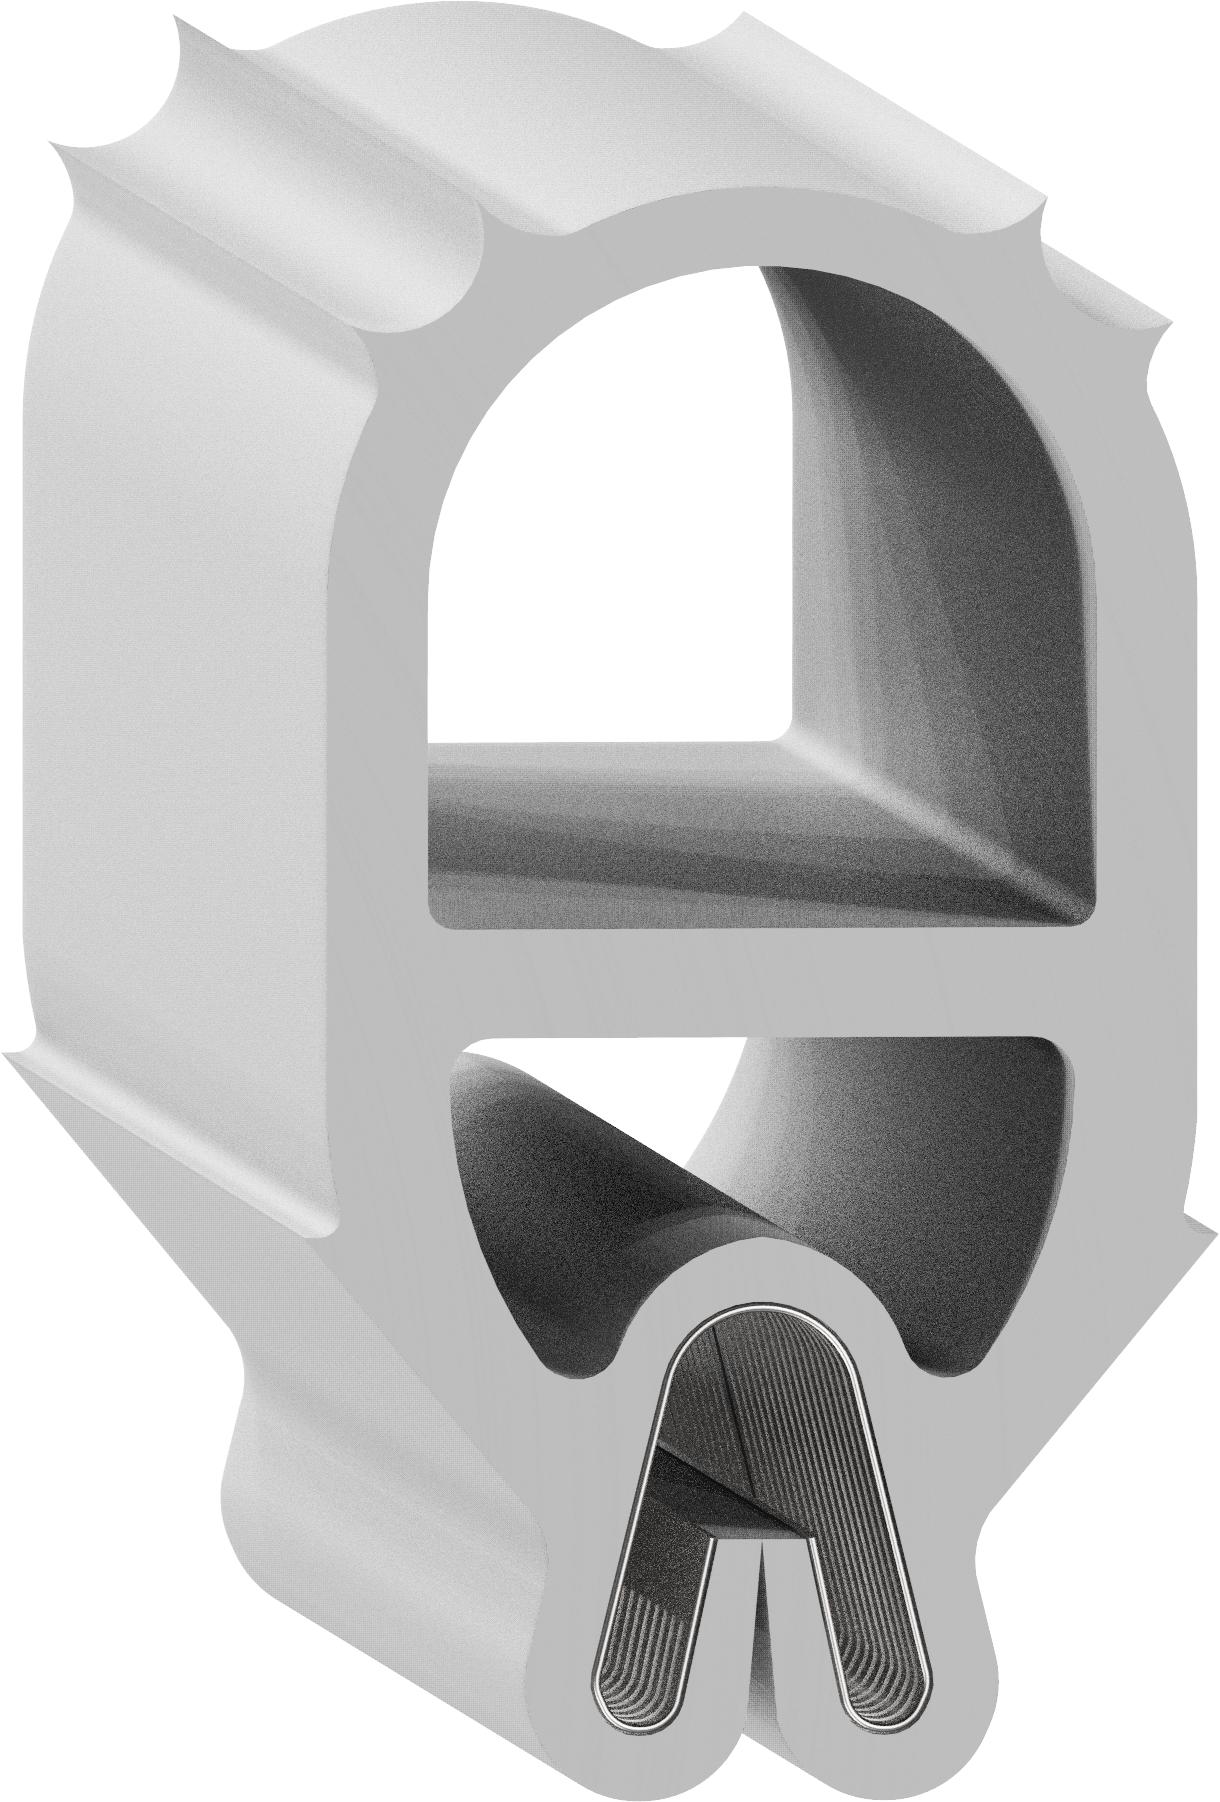 Uni-Grip part: SD-170-W